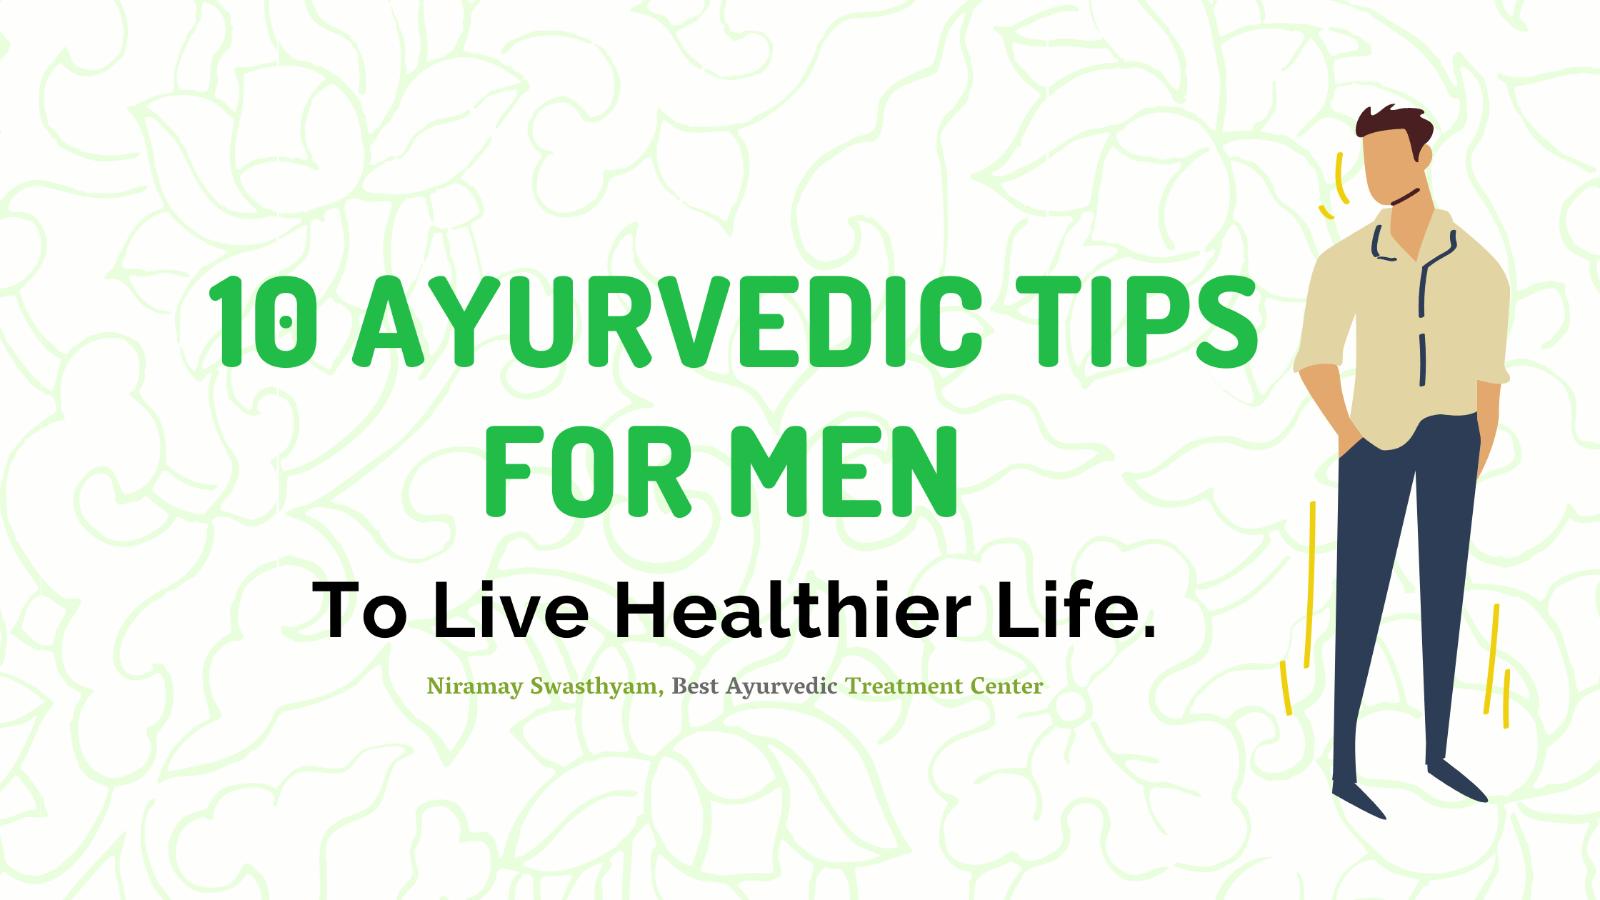 Ayurvedic Tips For Men To Live Healthier Life.